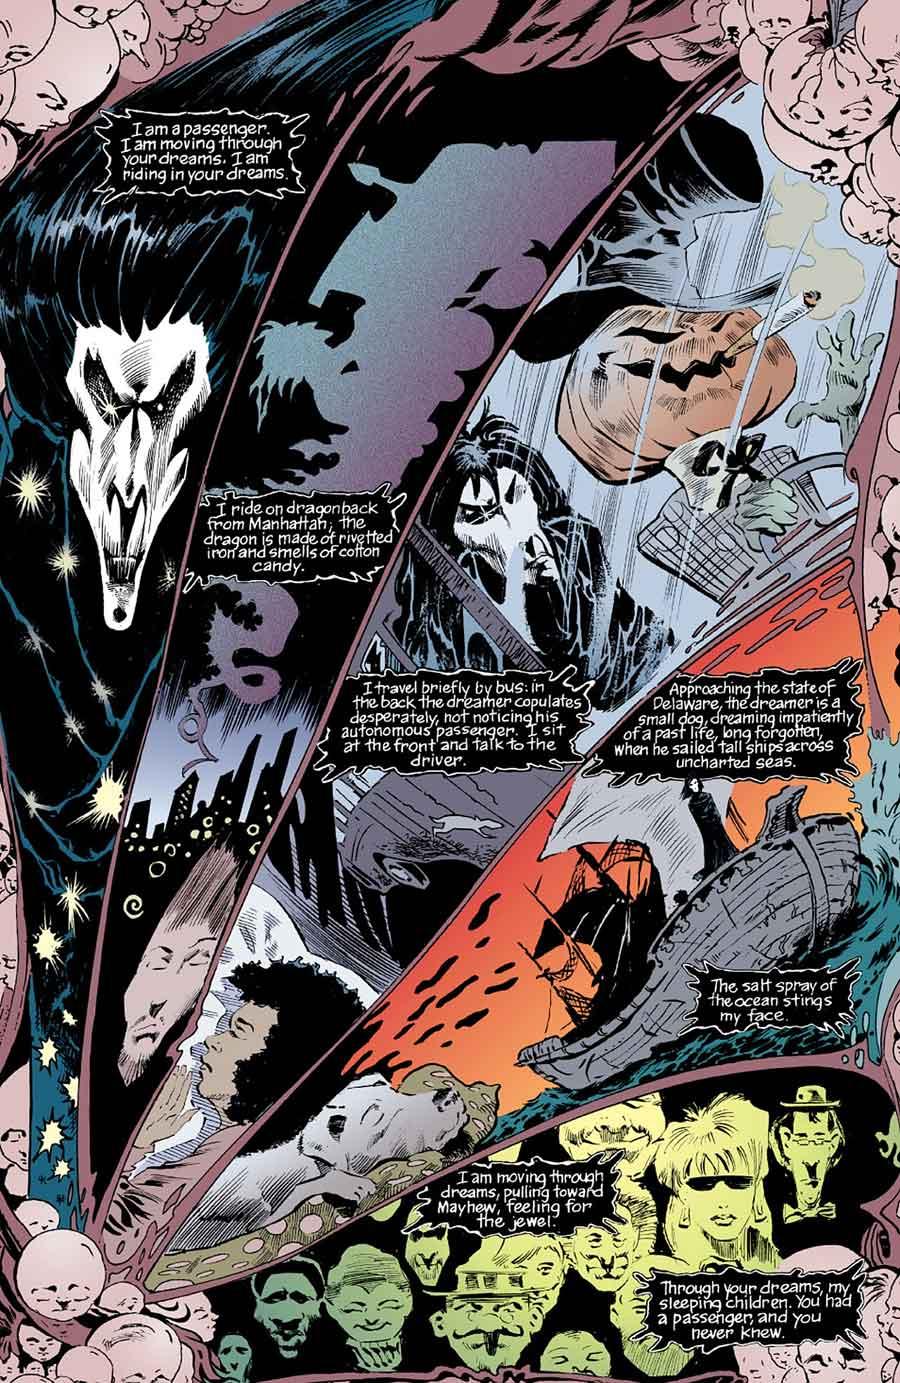 Sandman #5 by Neil Gaiman, Sam Keith, and Malcolm Jones III